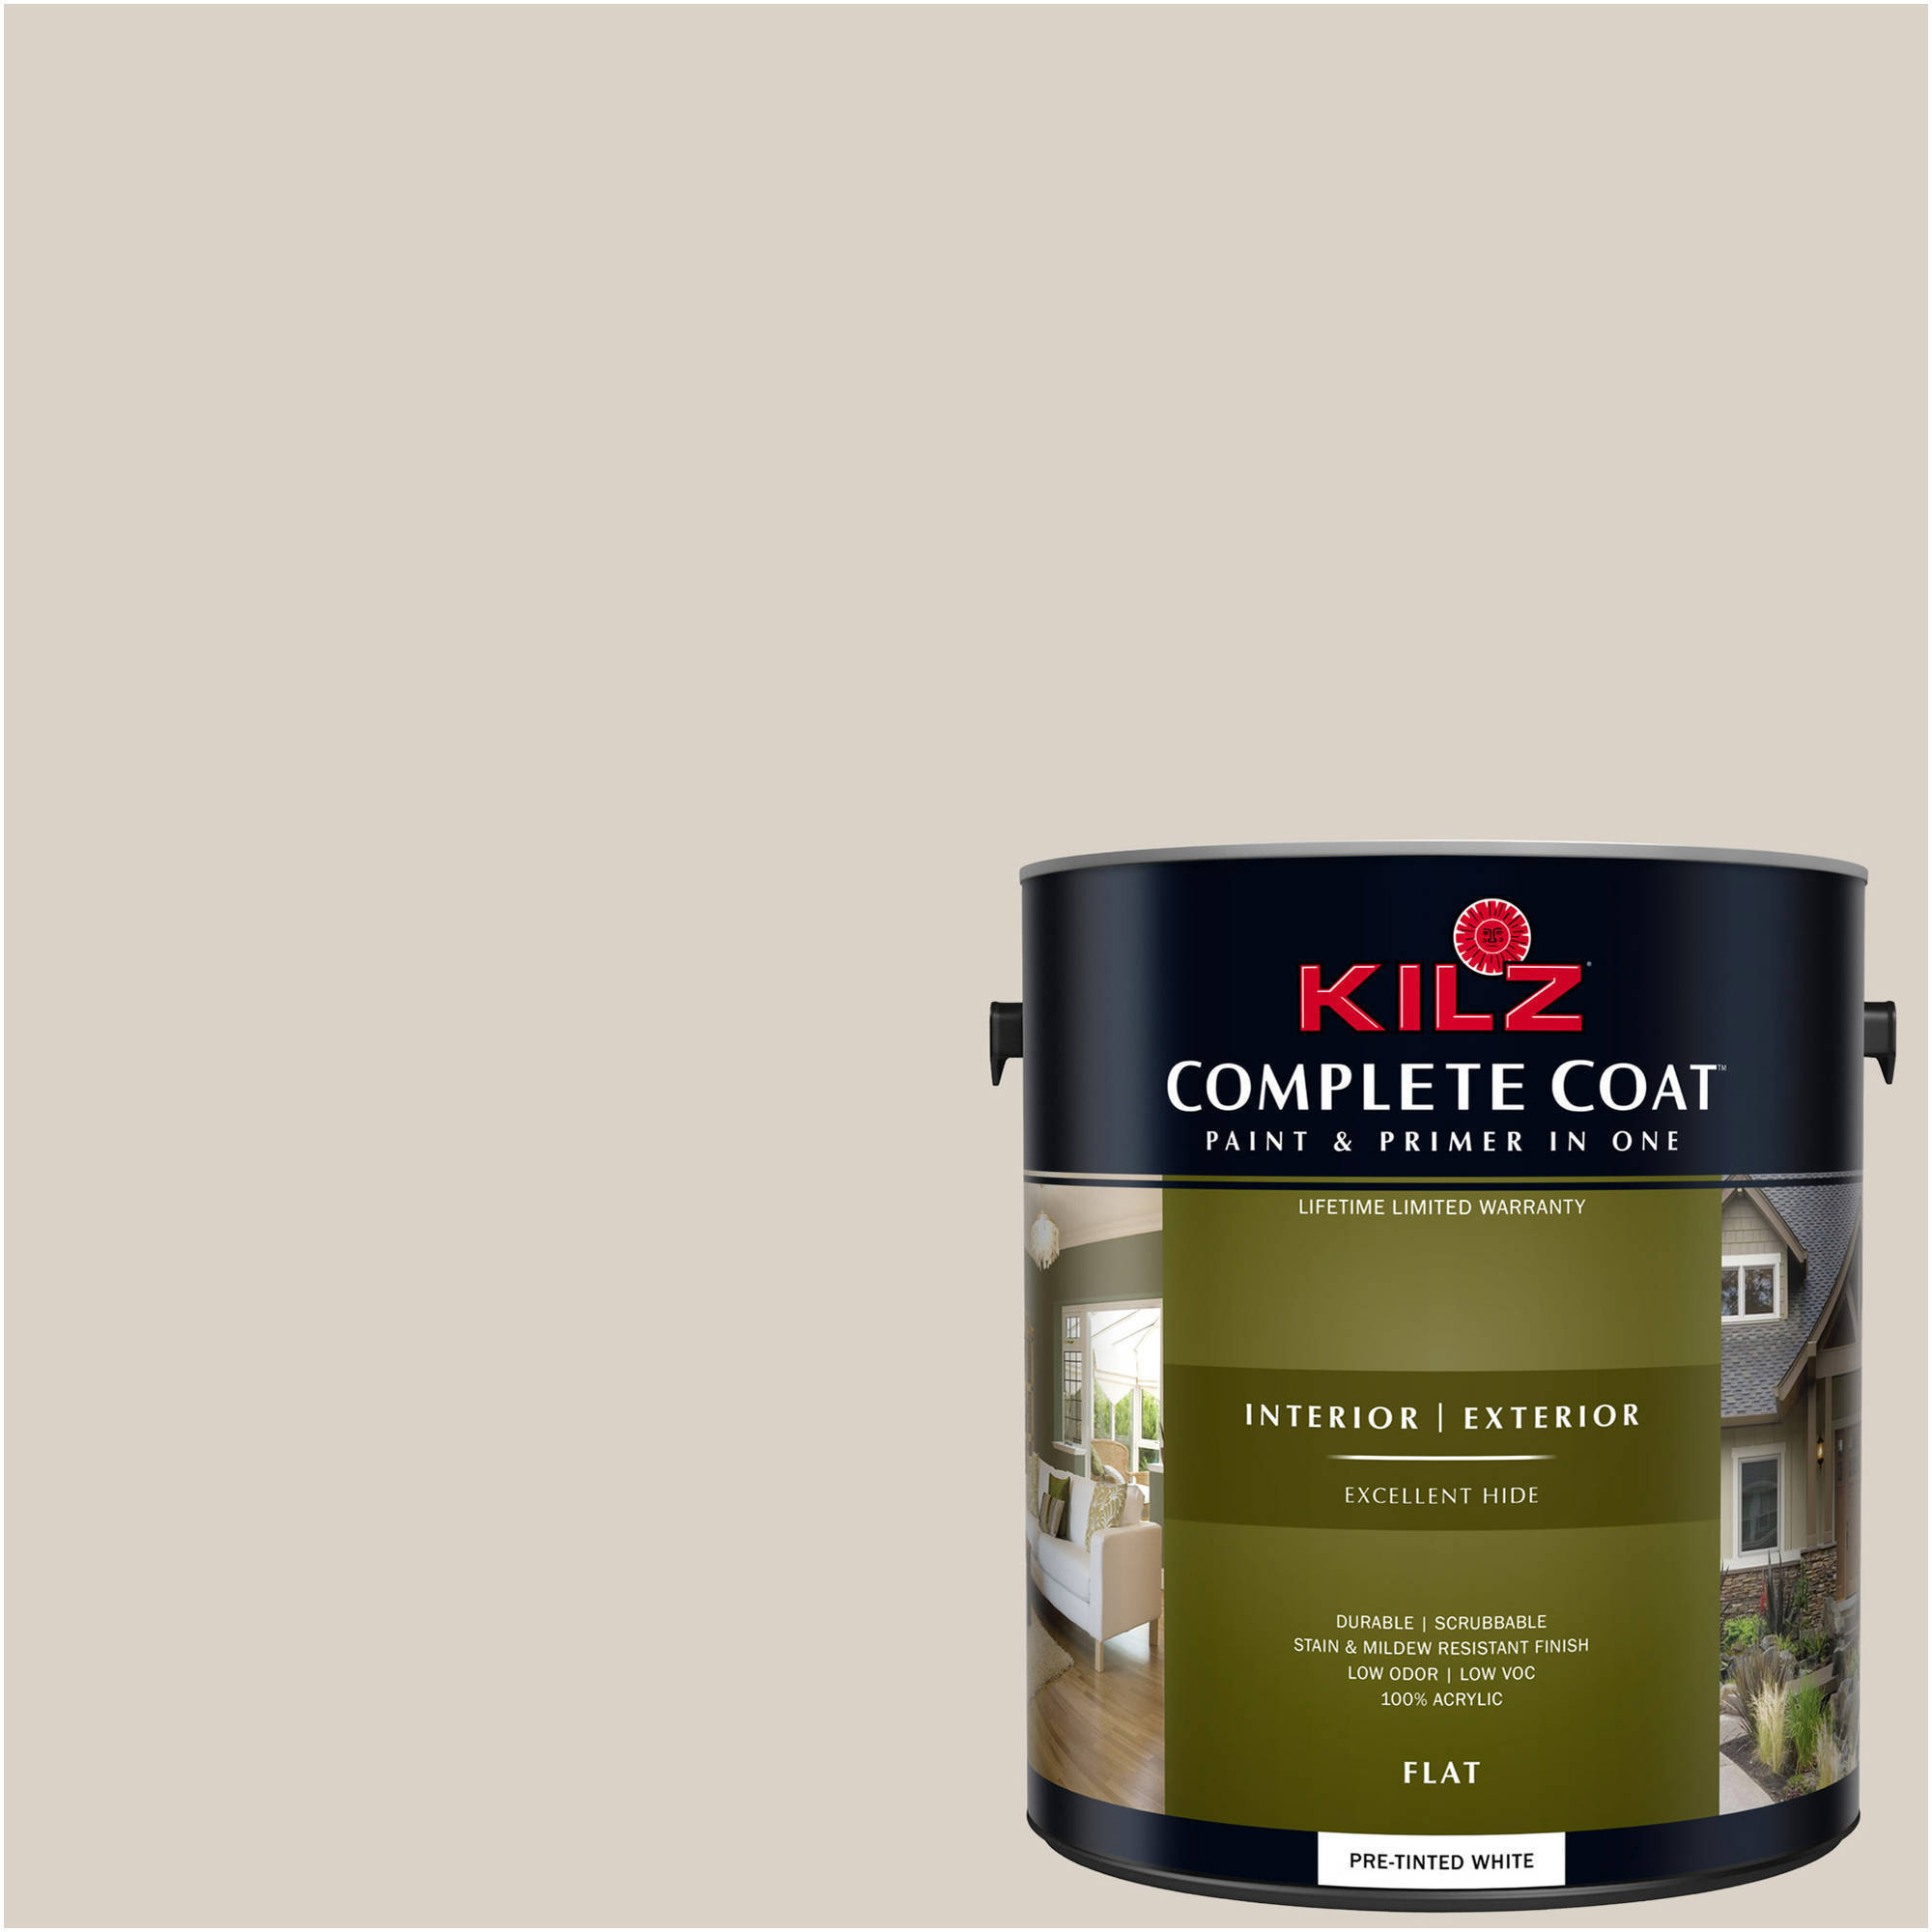 KILZ COMPLETE COAT Interior/Exterior Paint & Primer in One #LK210 Starched Linen